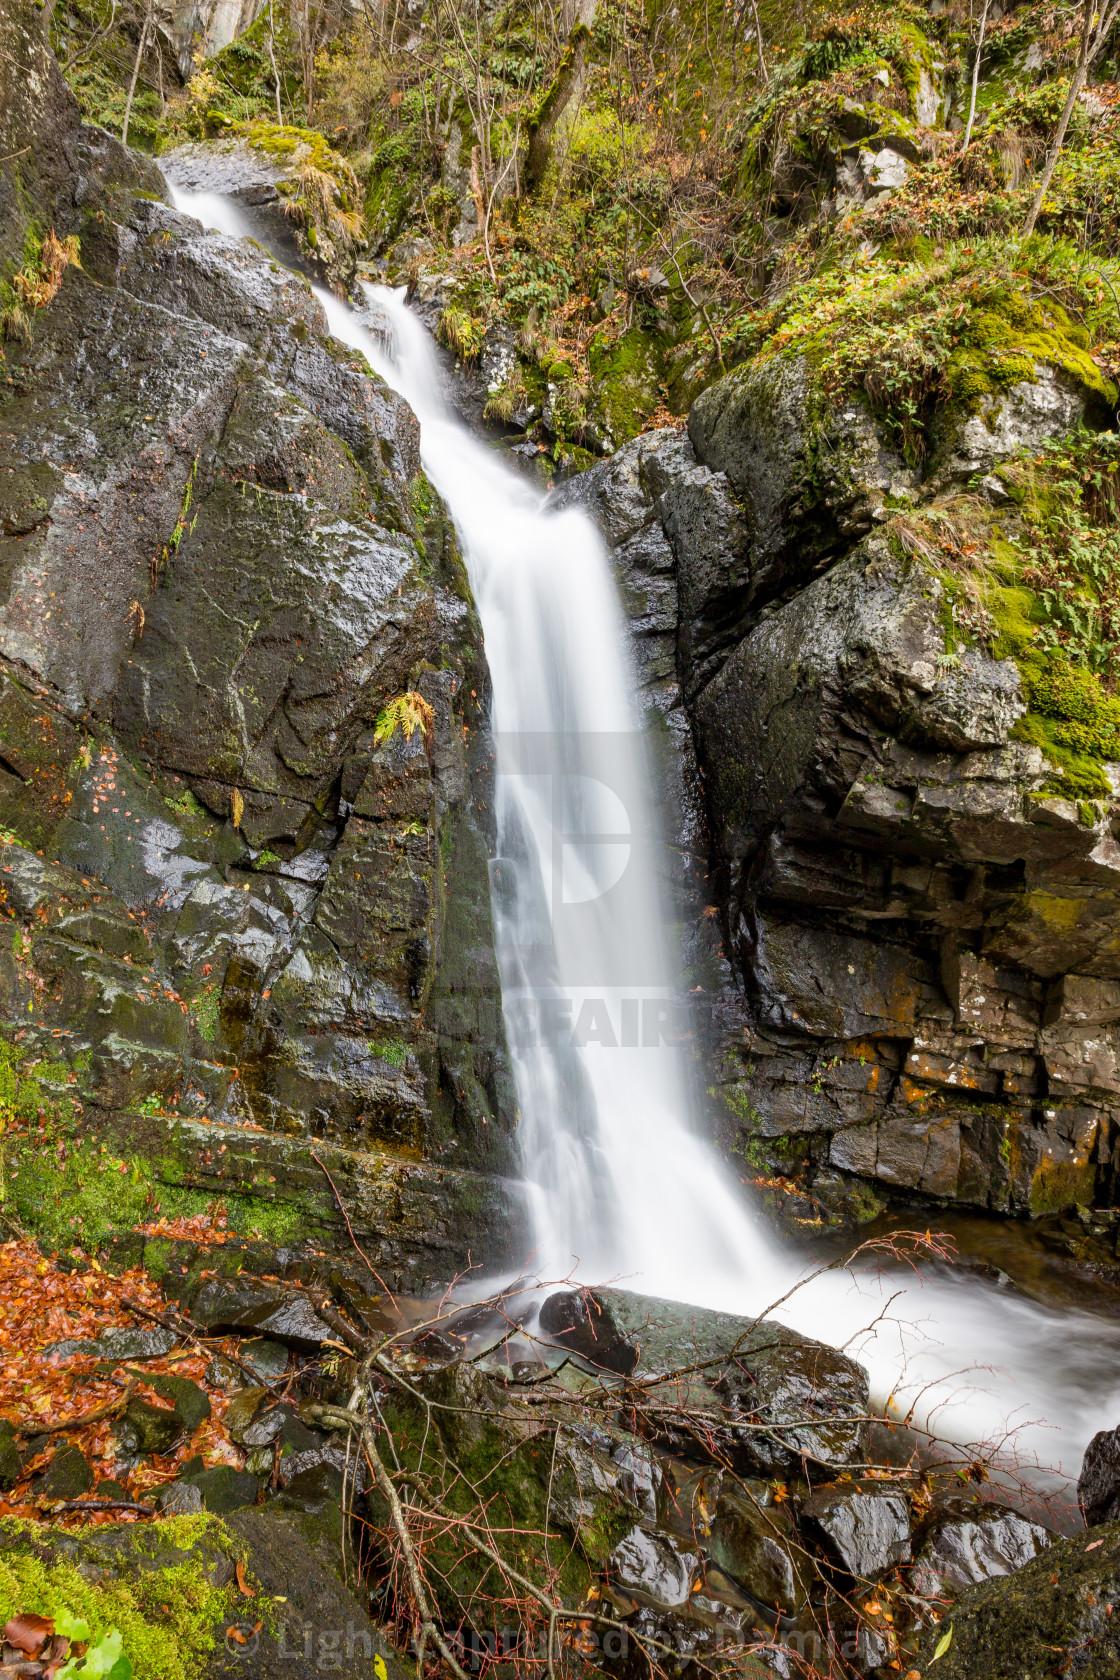 """Small blurred waterfall near Sofia, Bulgaria"" stock image"